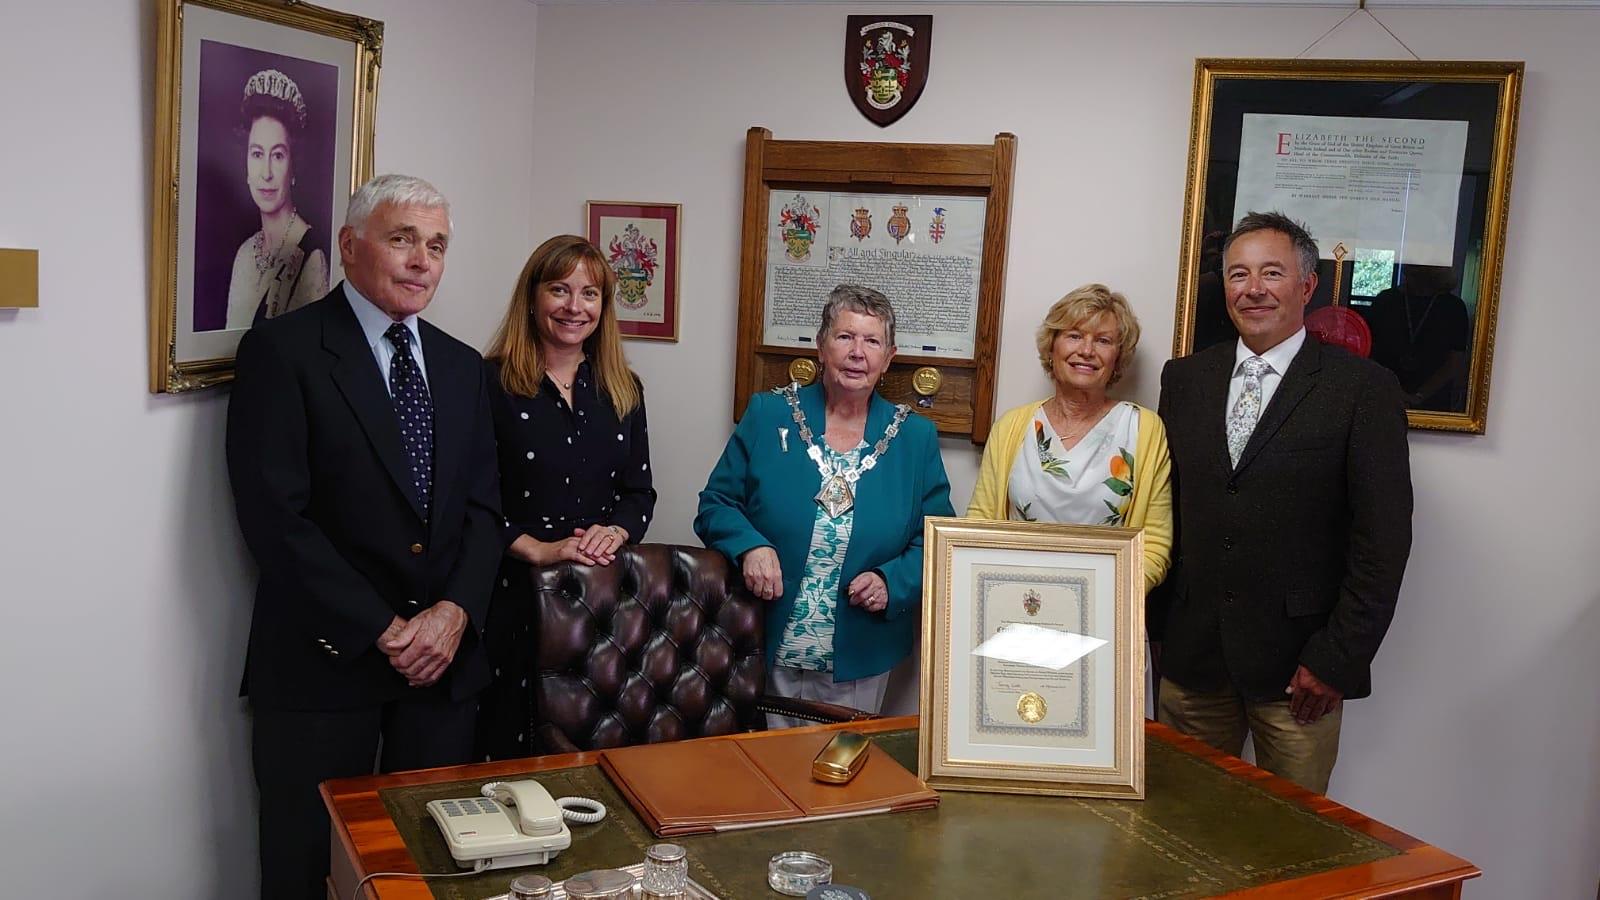 Celebrating 50 years with the Mayor!